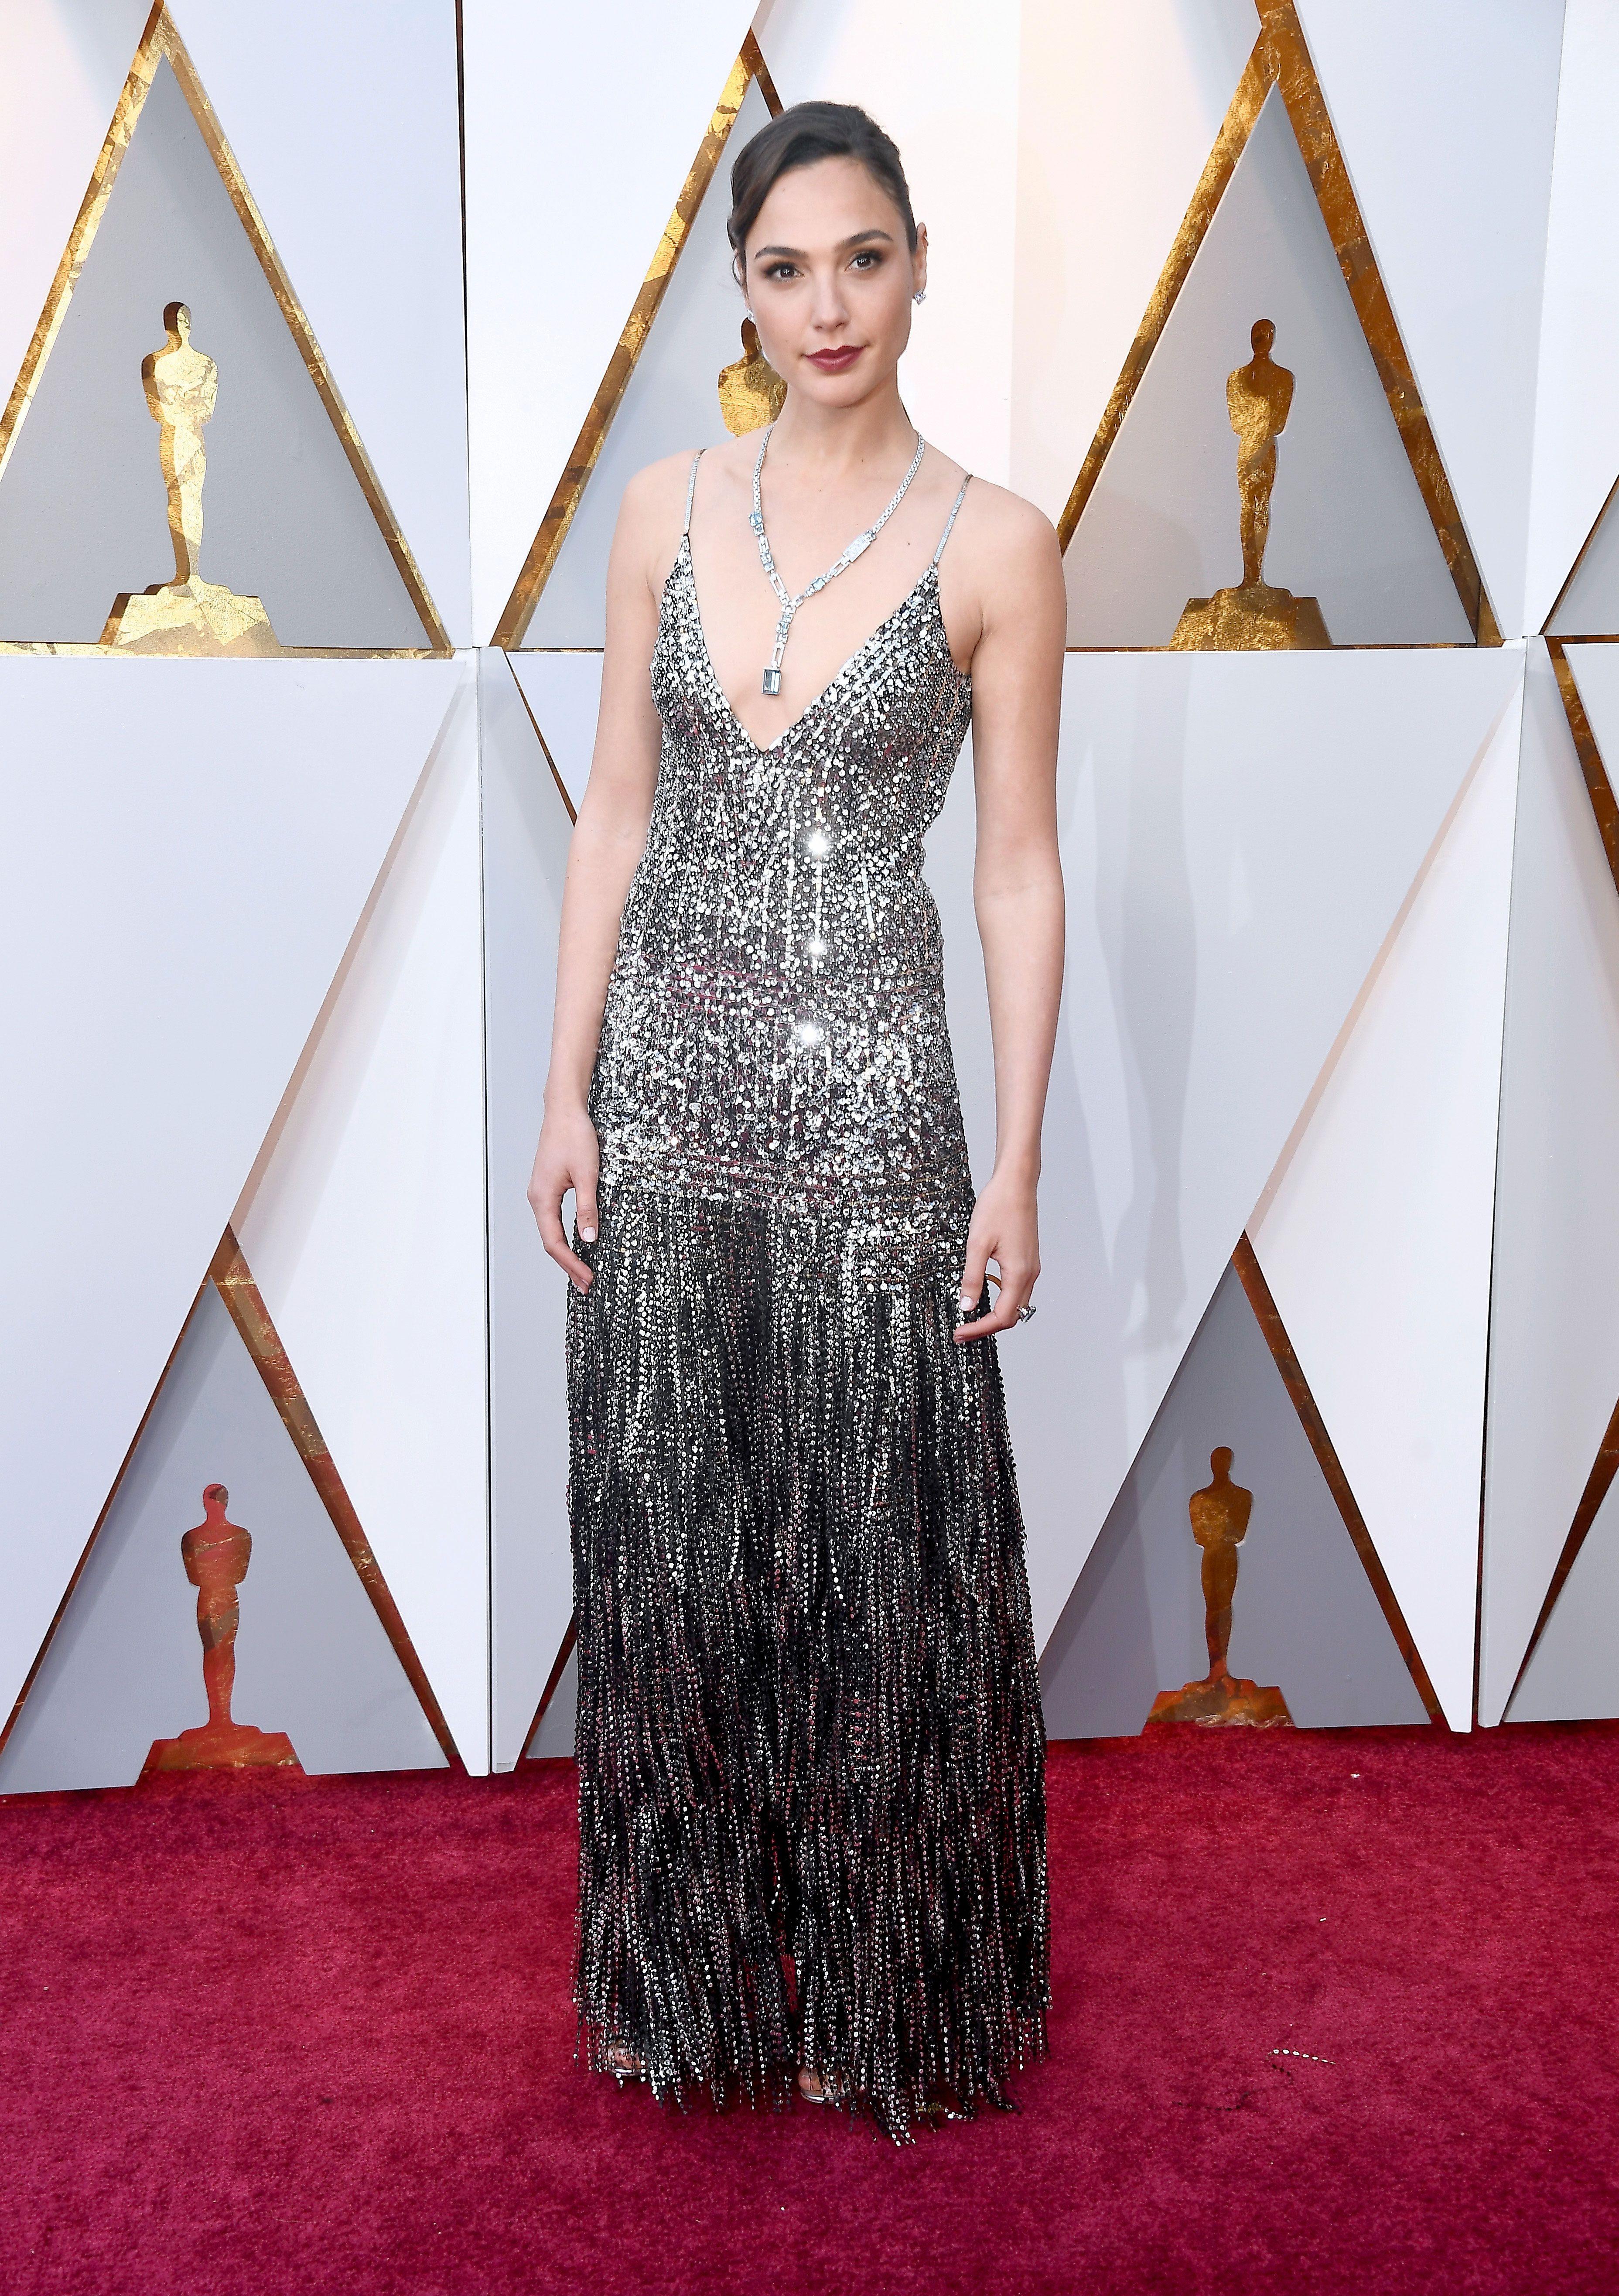 Oscars Best Dressed 2018